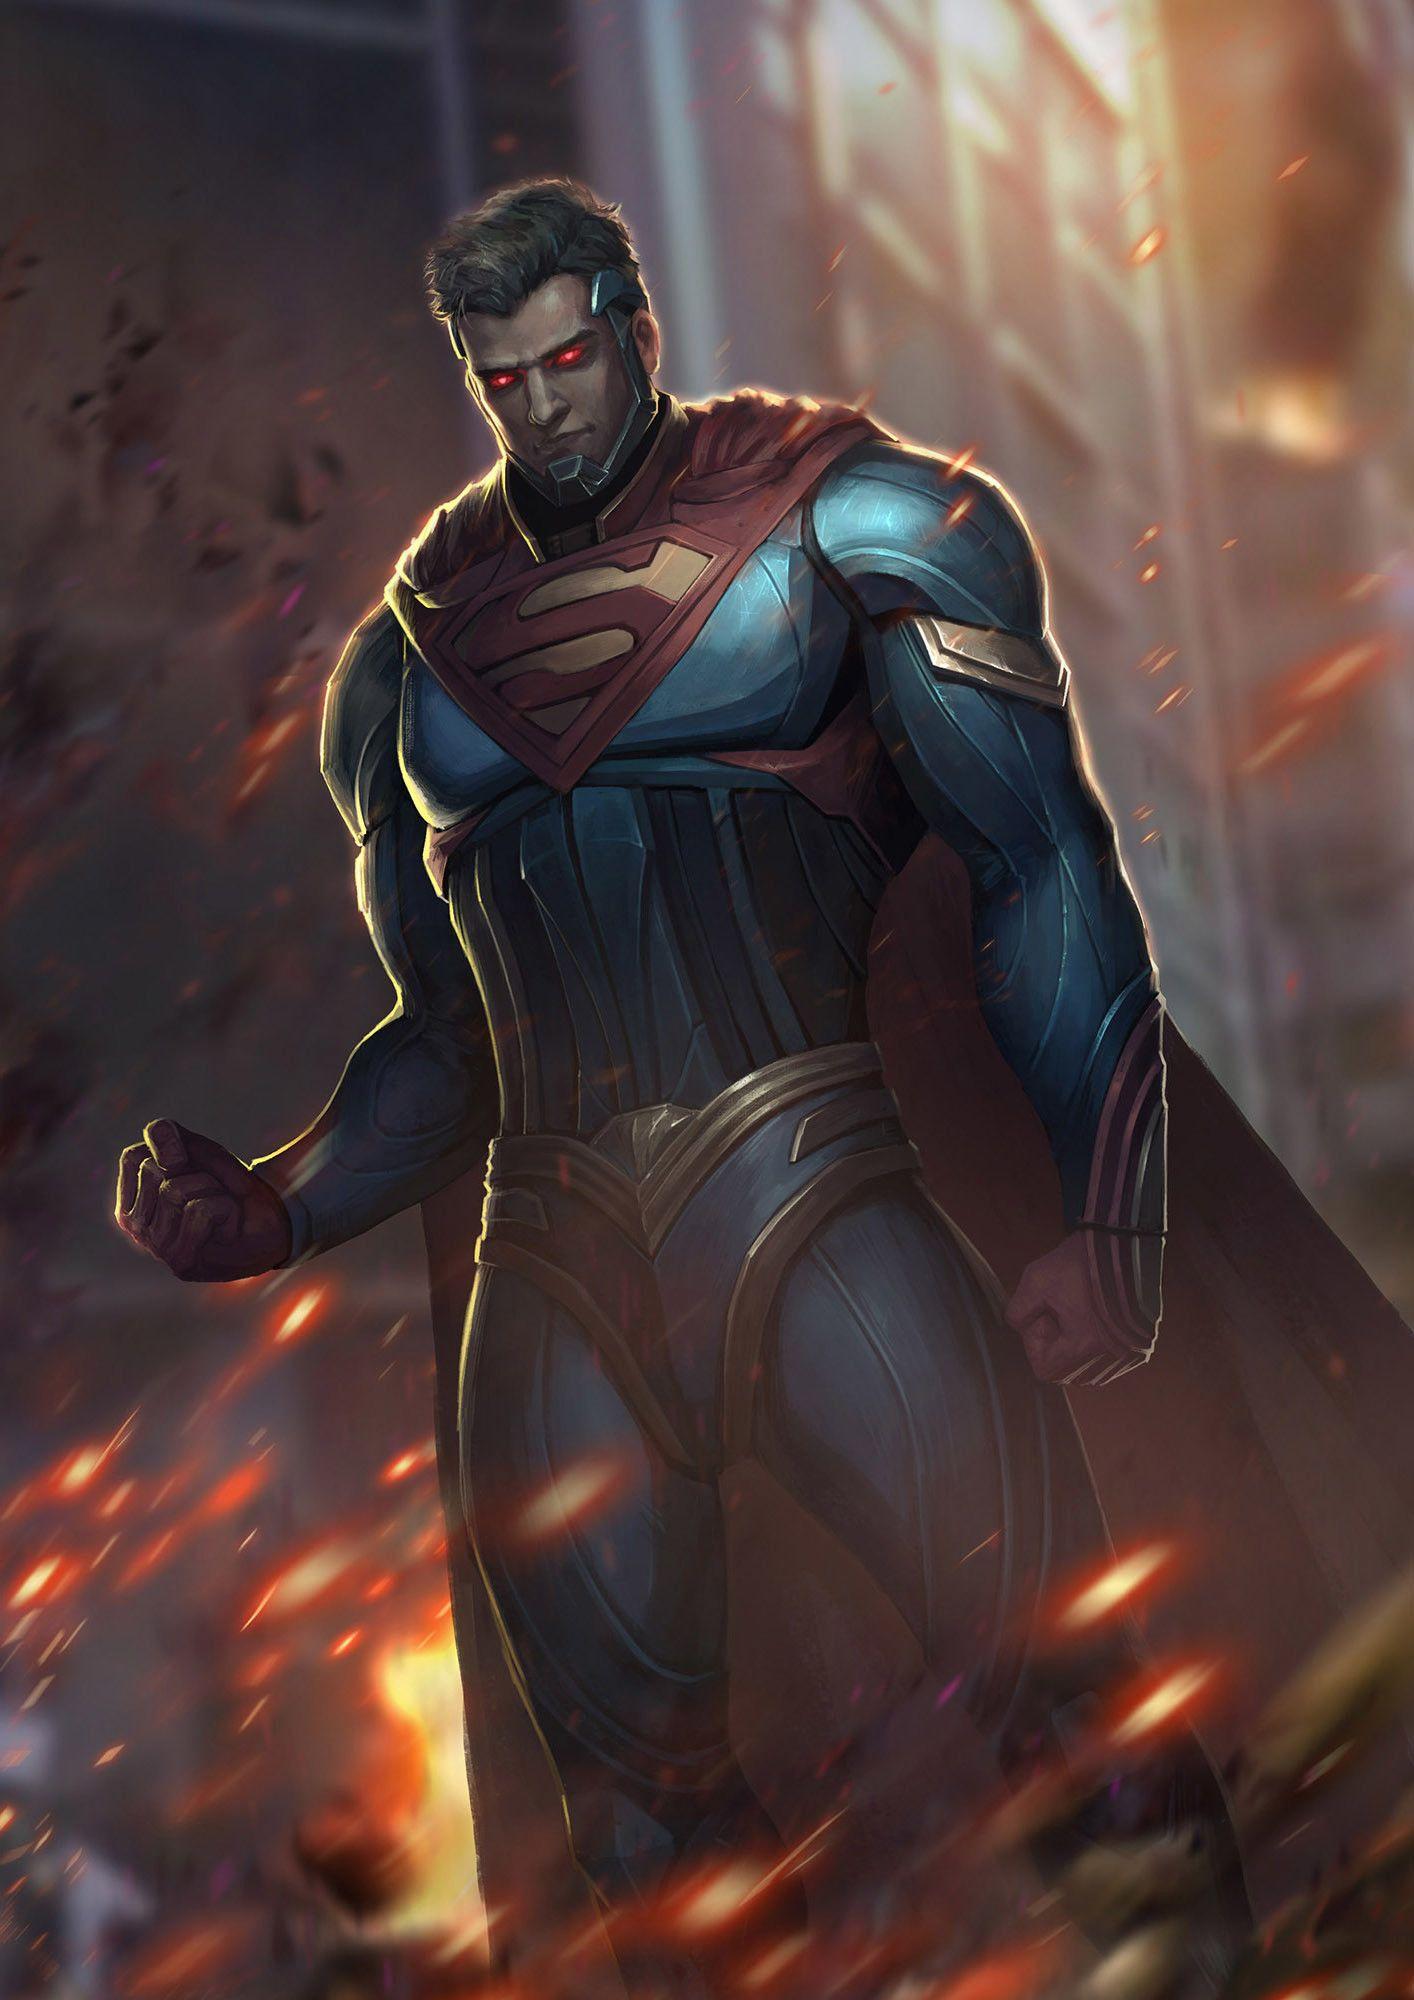 Injustice League Superman By Xiaochen Li Dc Comics Superman Batman And Superman Evil Superman